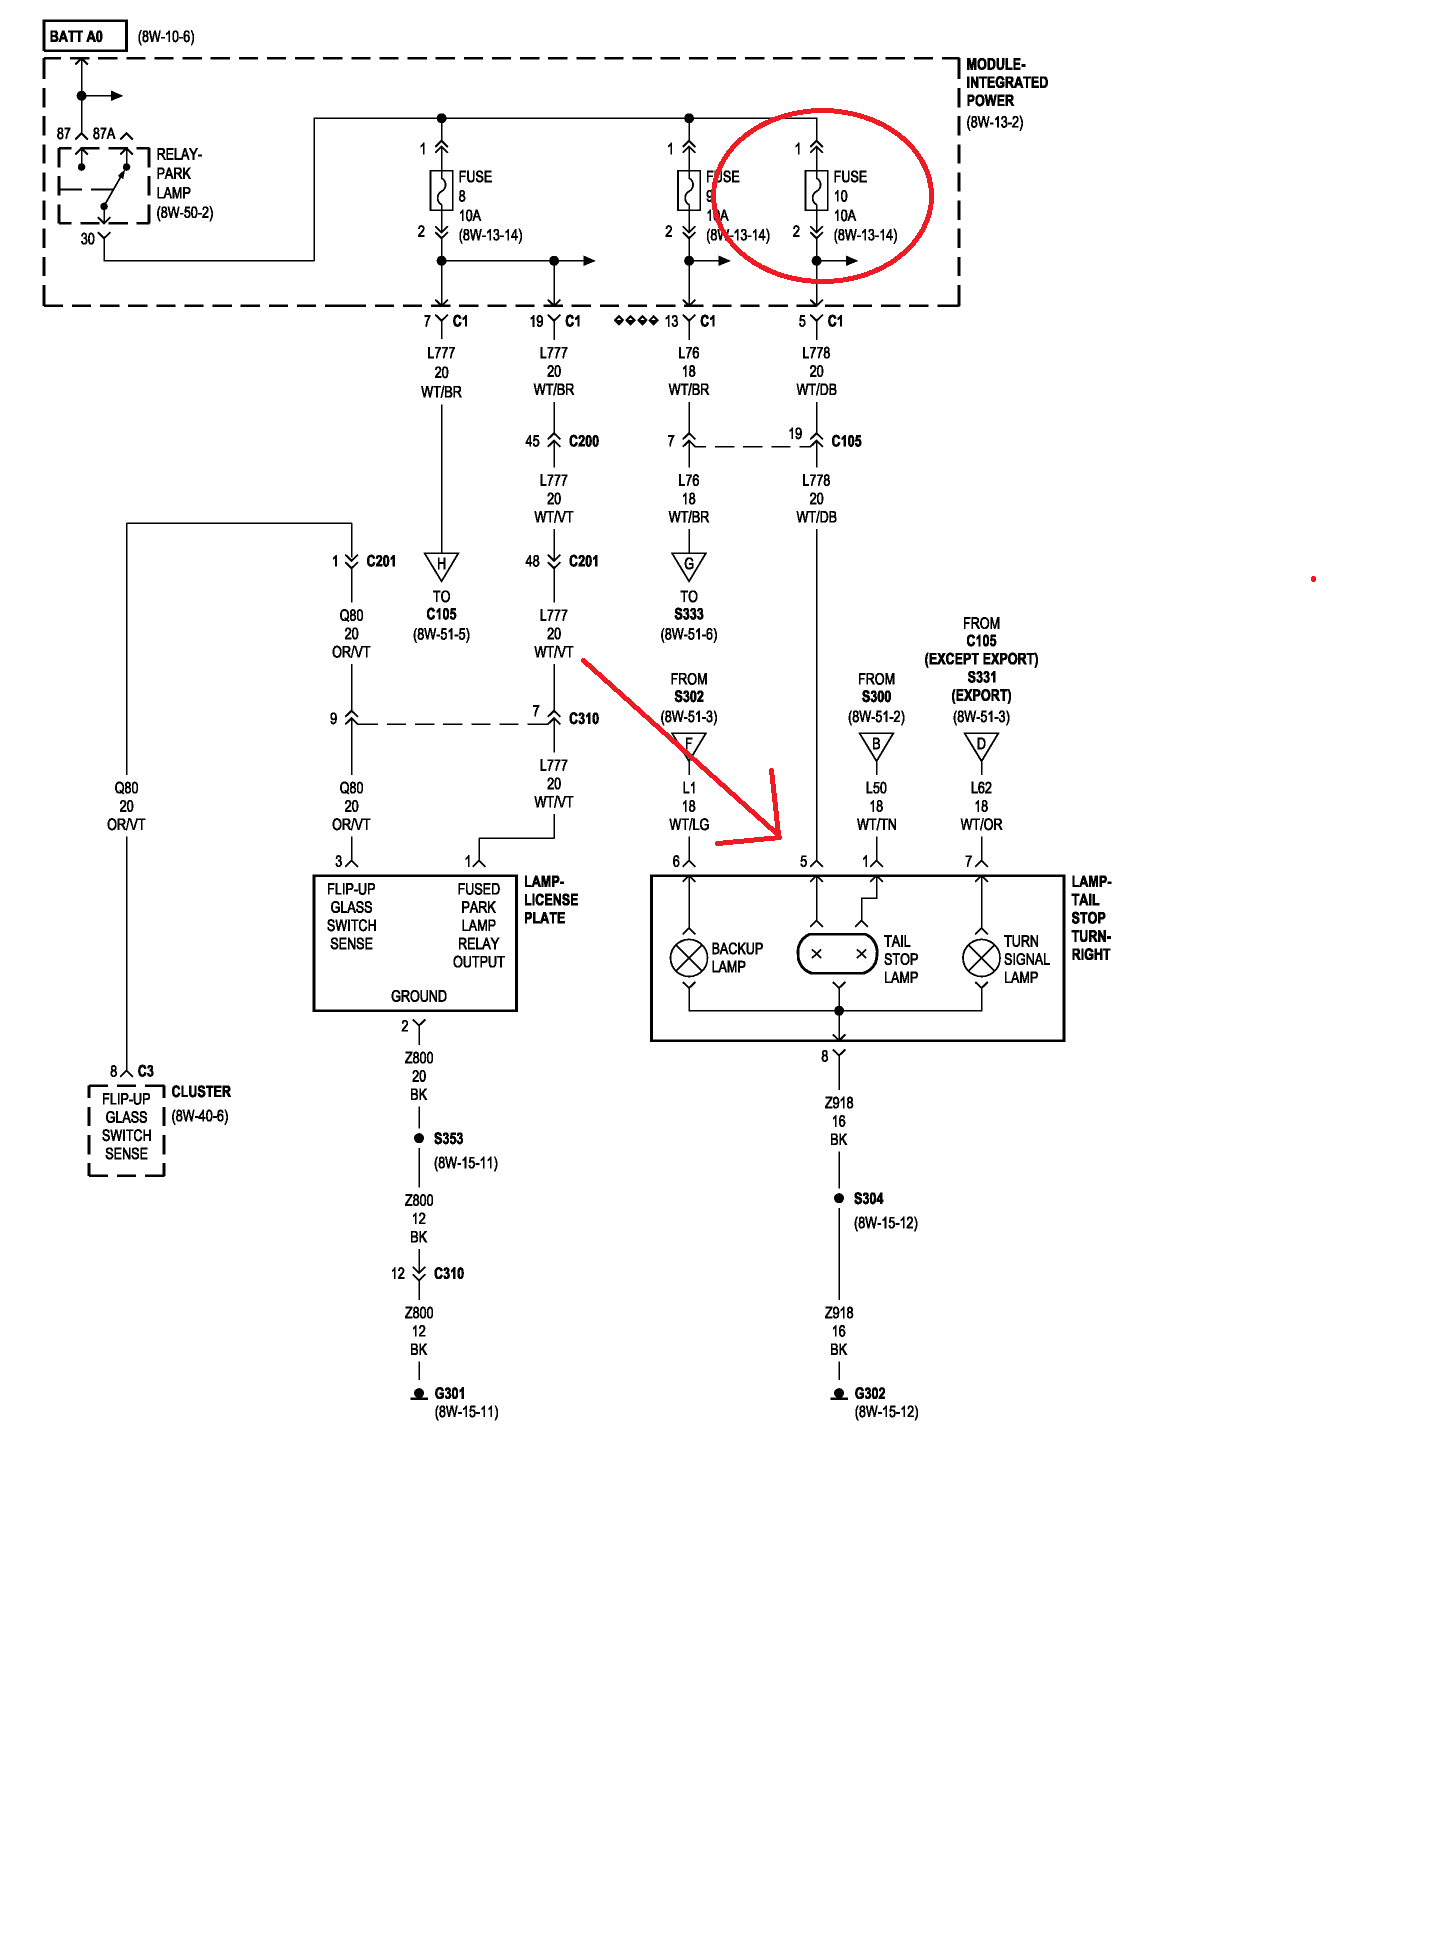 2006 jeep wrangler wiring diagram wiring diagram 2006 jeep wrangler wiring diagrams show  wiring diagram 2006 jeep wrangler